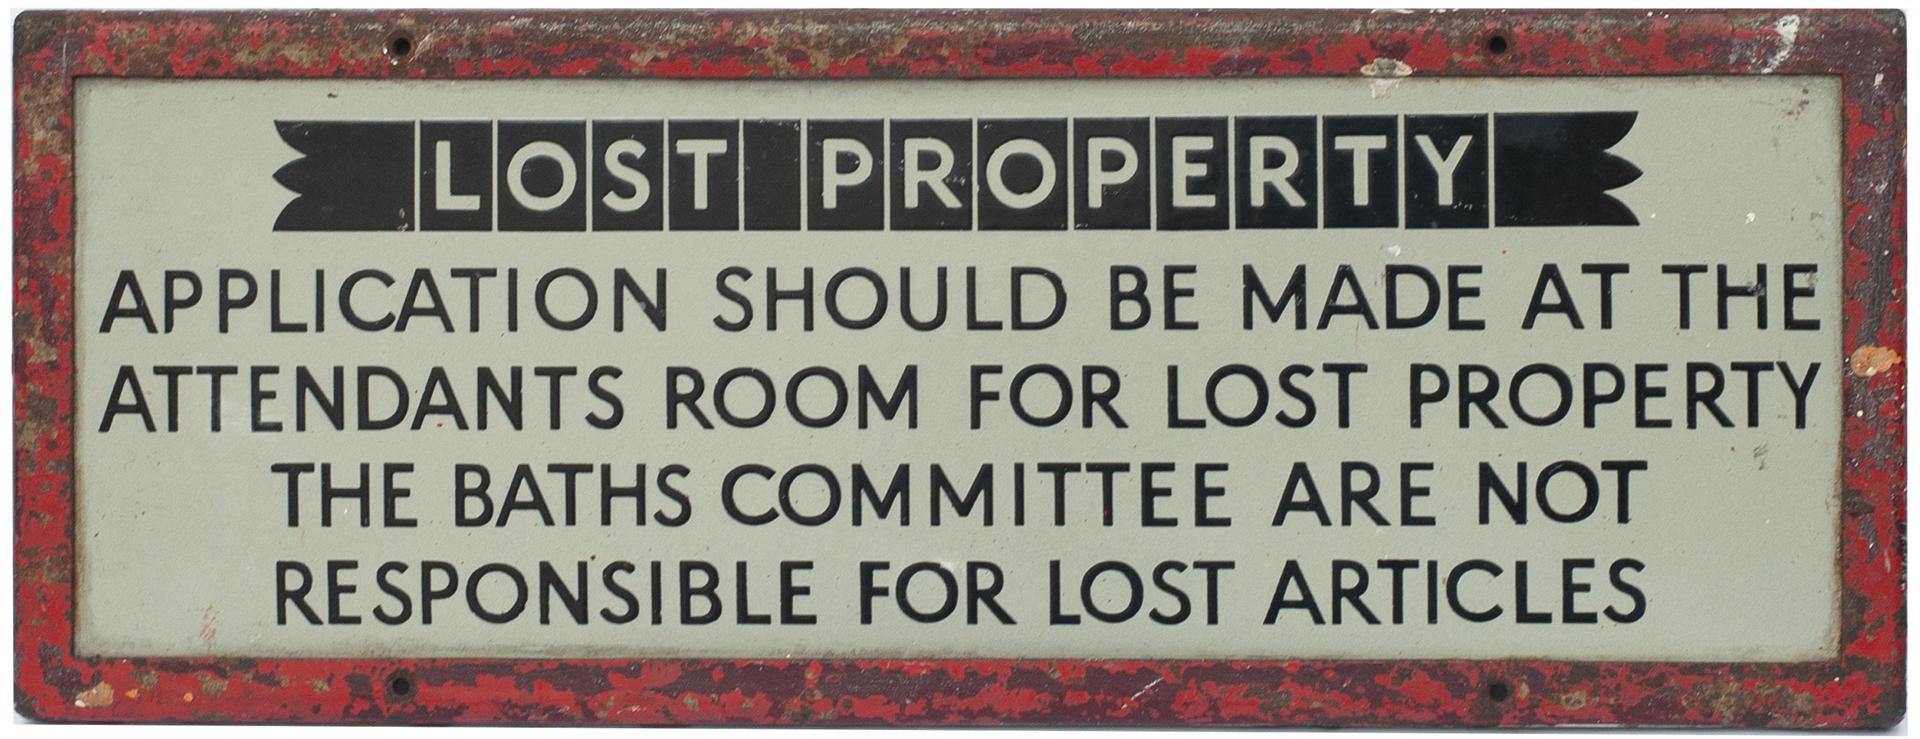 Enamel Doorplate LOST PROPERTY APPLICATIONS SHOULD